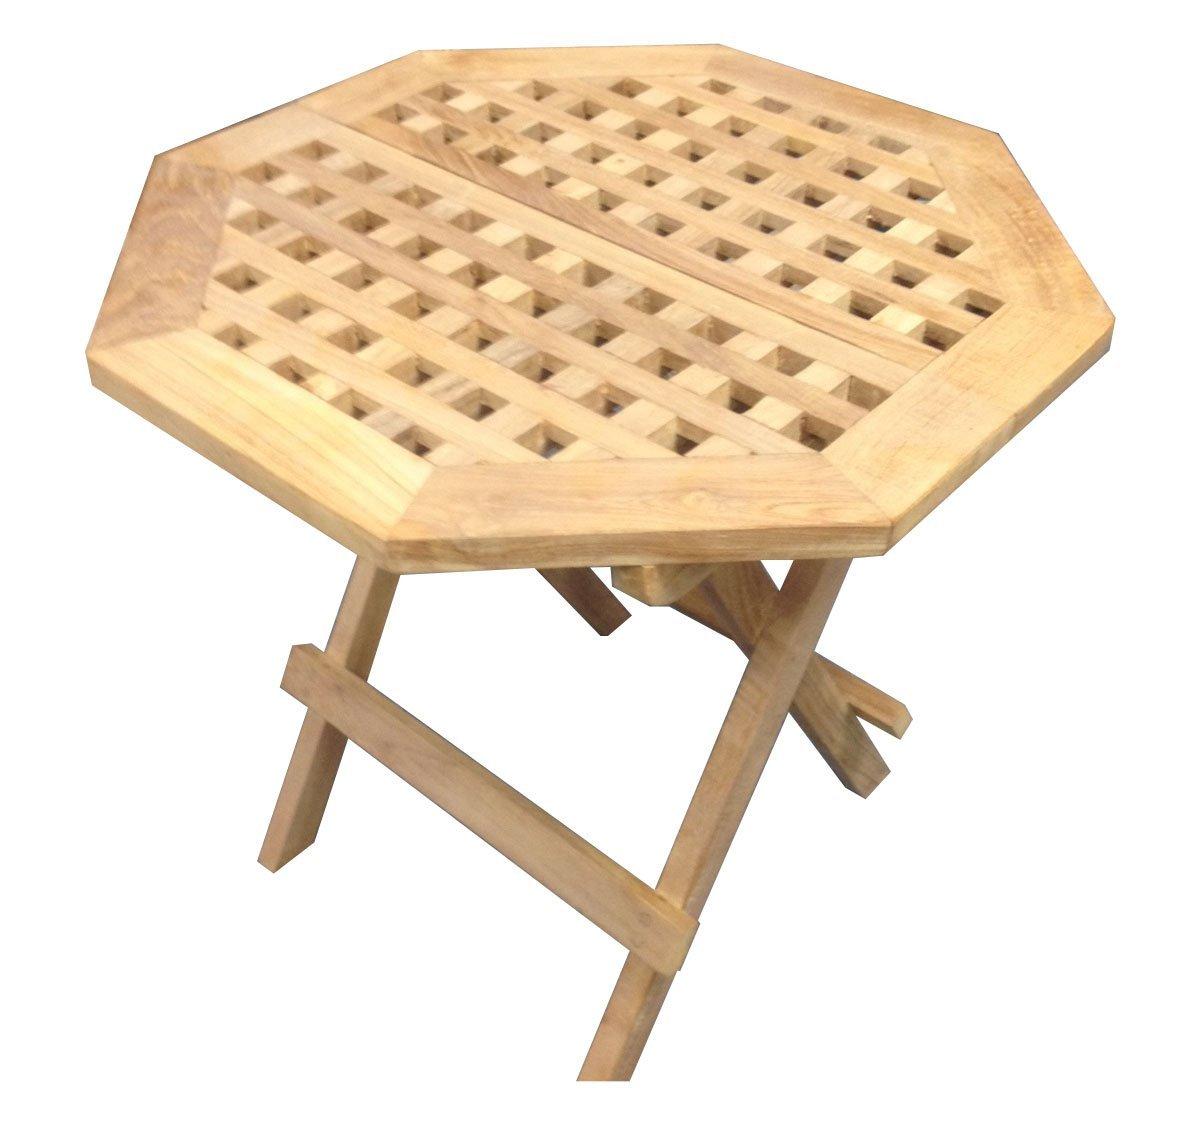 D-Art Collection Teak Octagonal Picnic Table